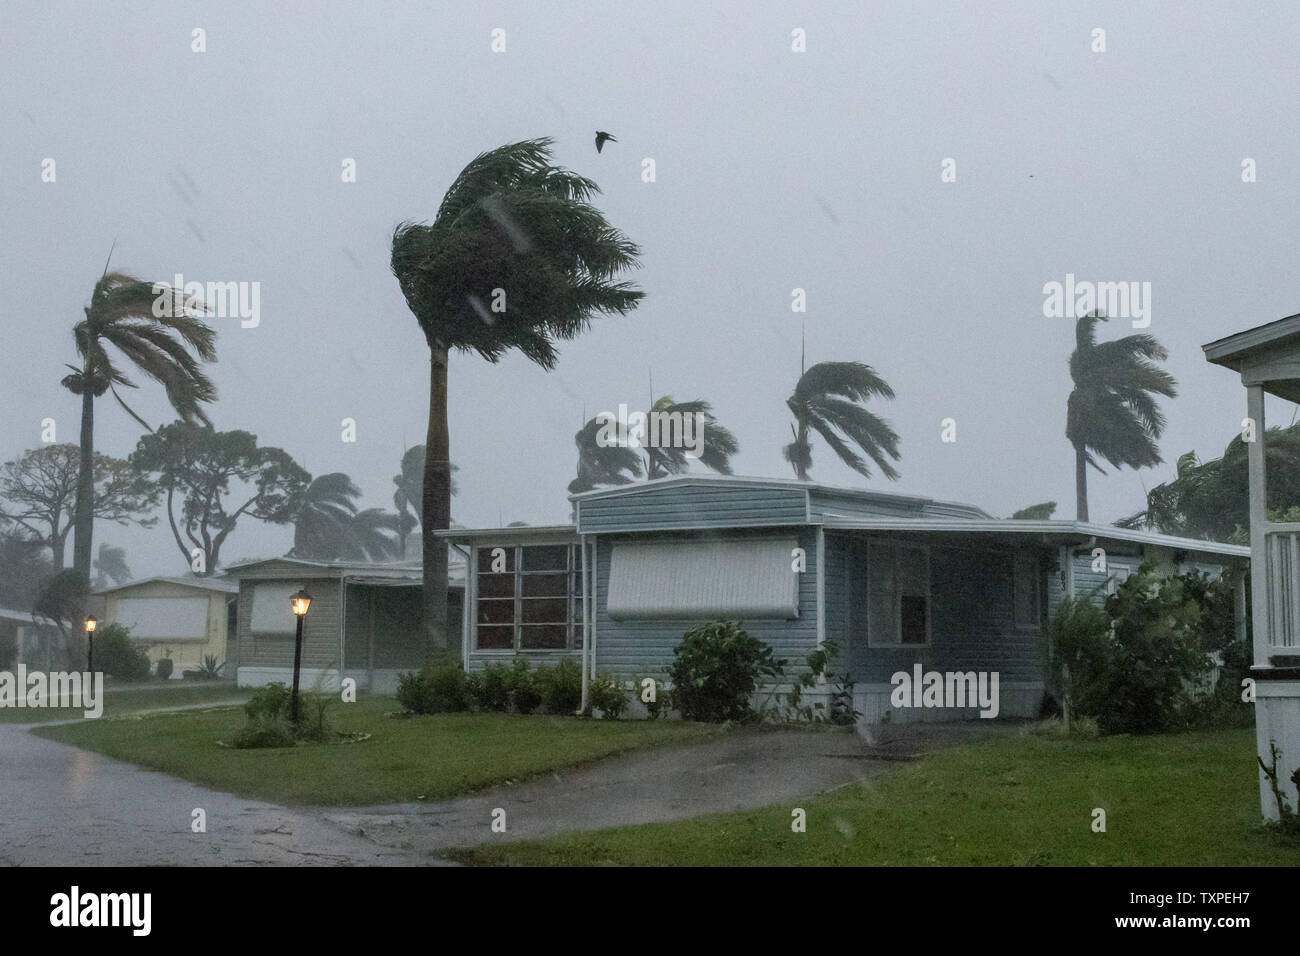 High winds and rain blows through Colonial Estates Mobile ... on rain san francisco, rain south carolina, rain los angeles,